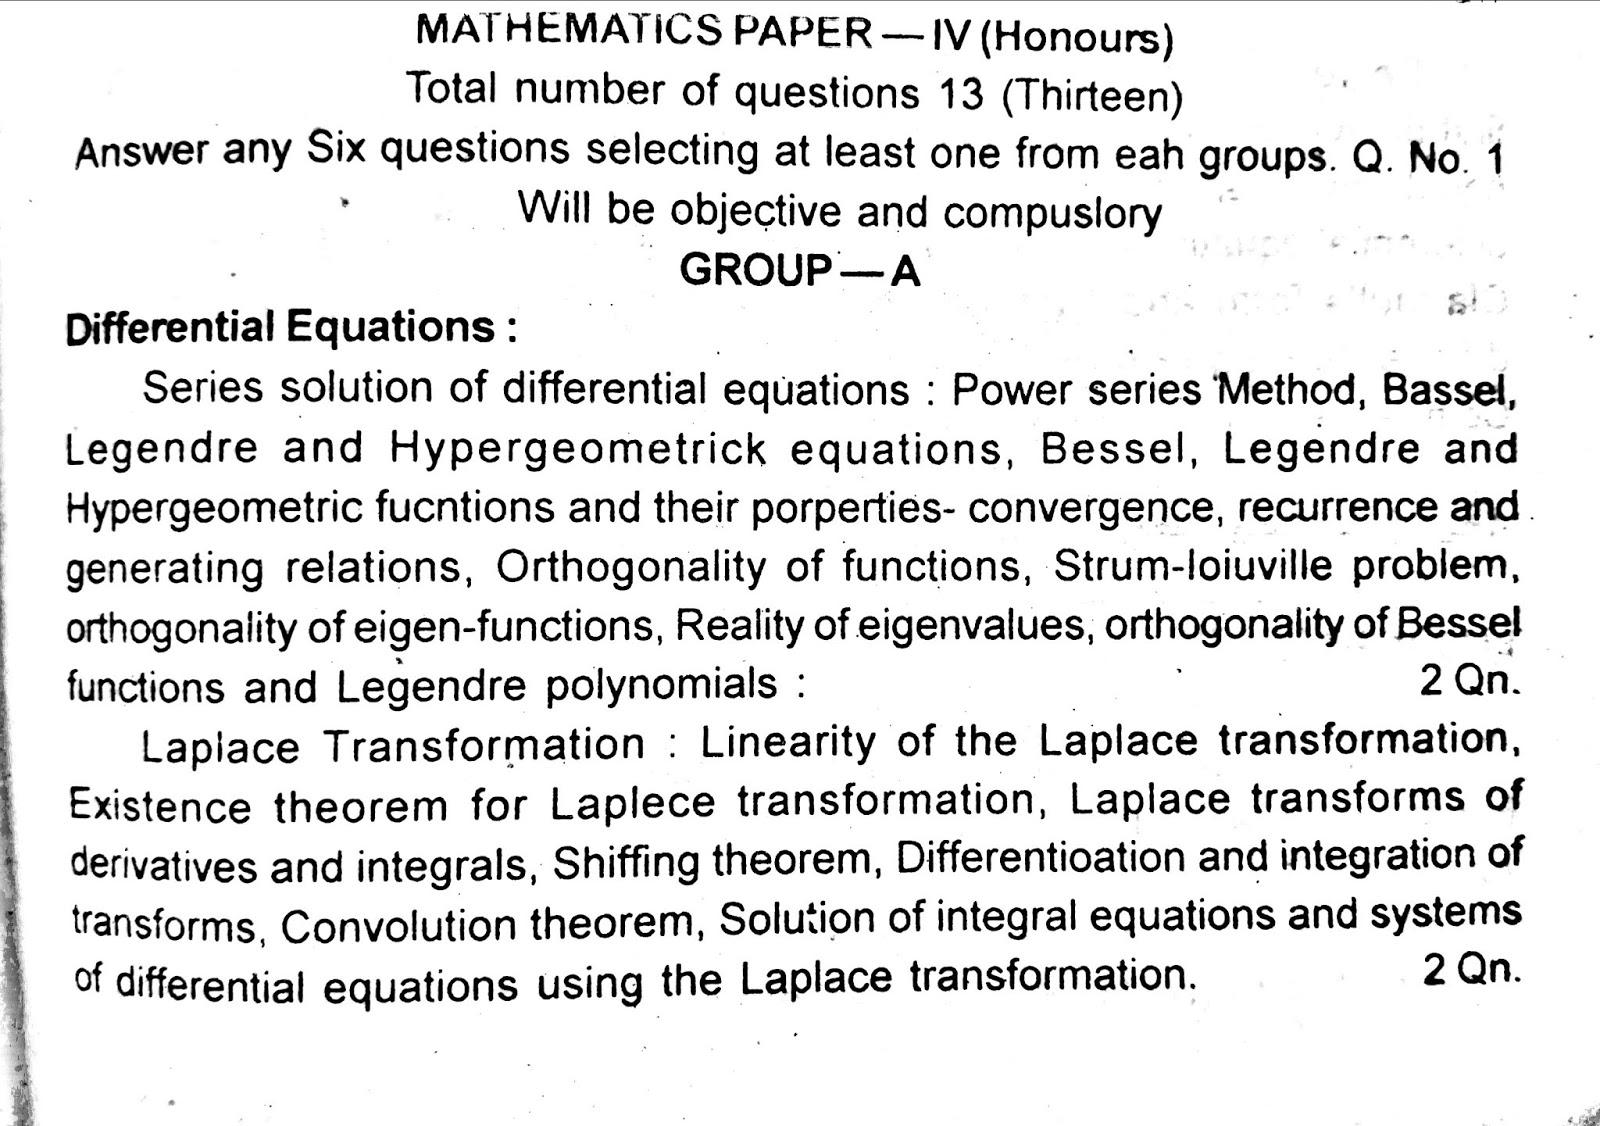 B A  and B Sc  1,2, and 3 year syllabus for TMBU: Mathematics